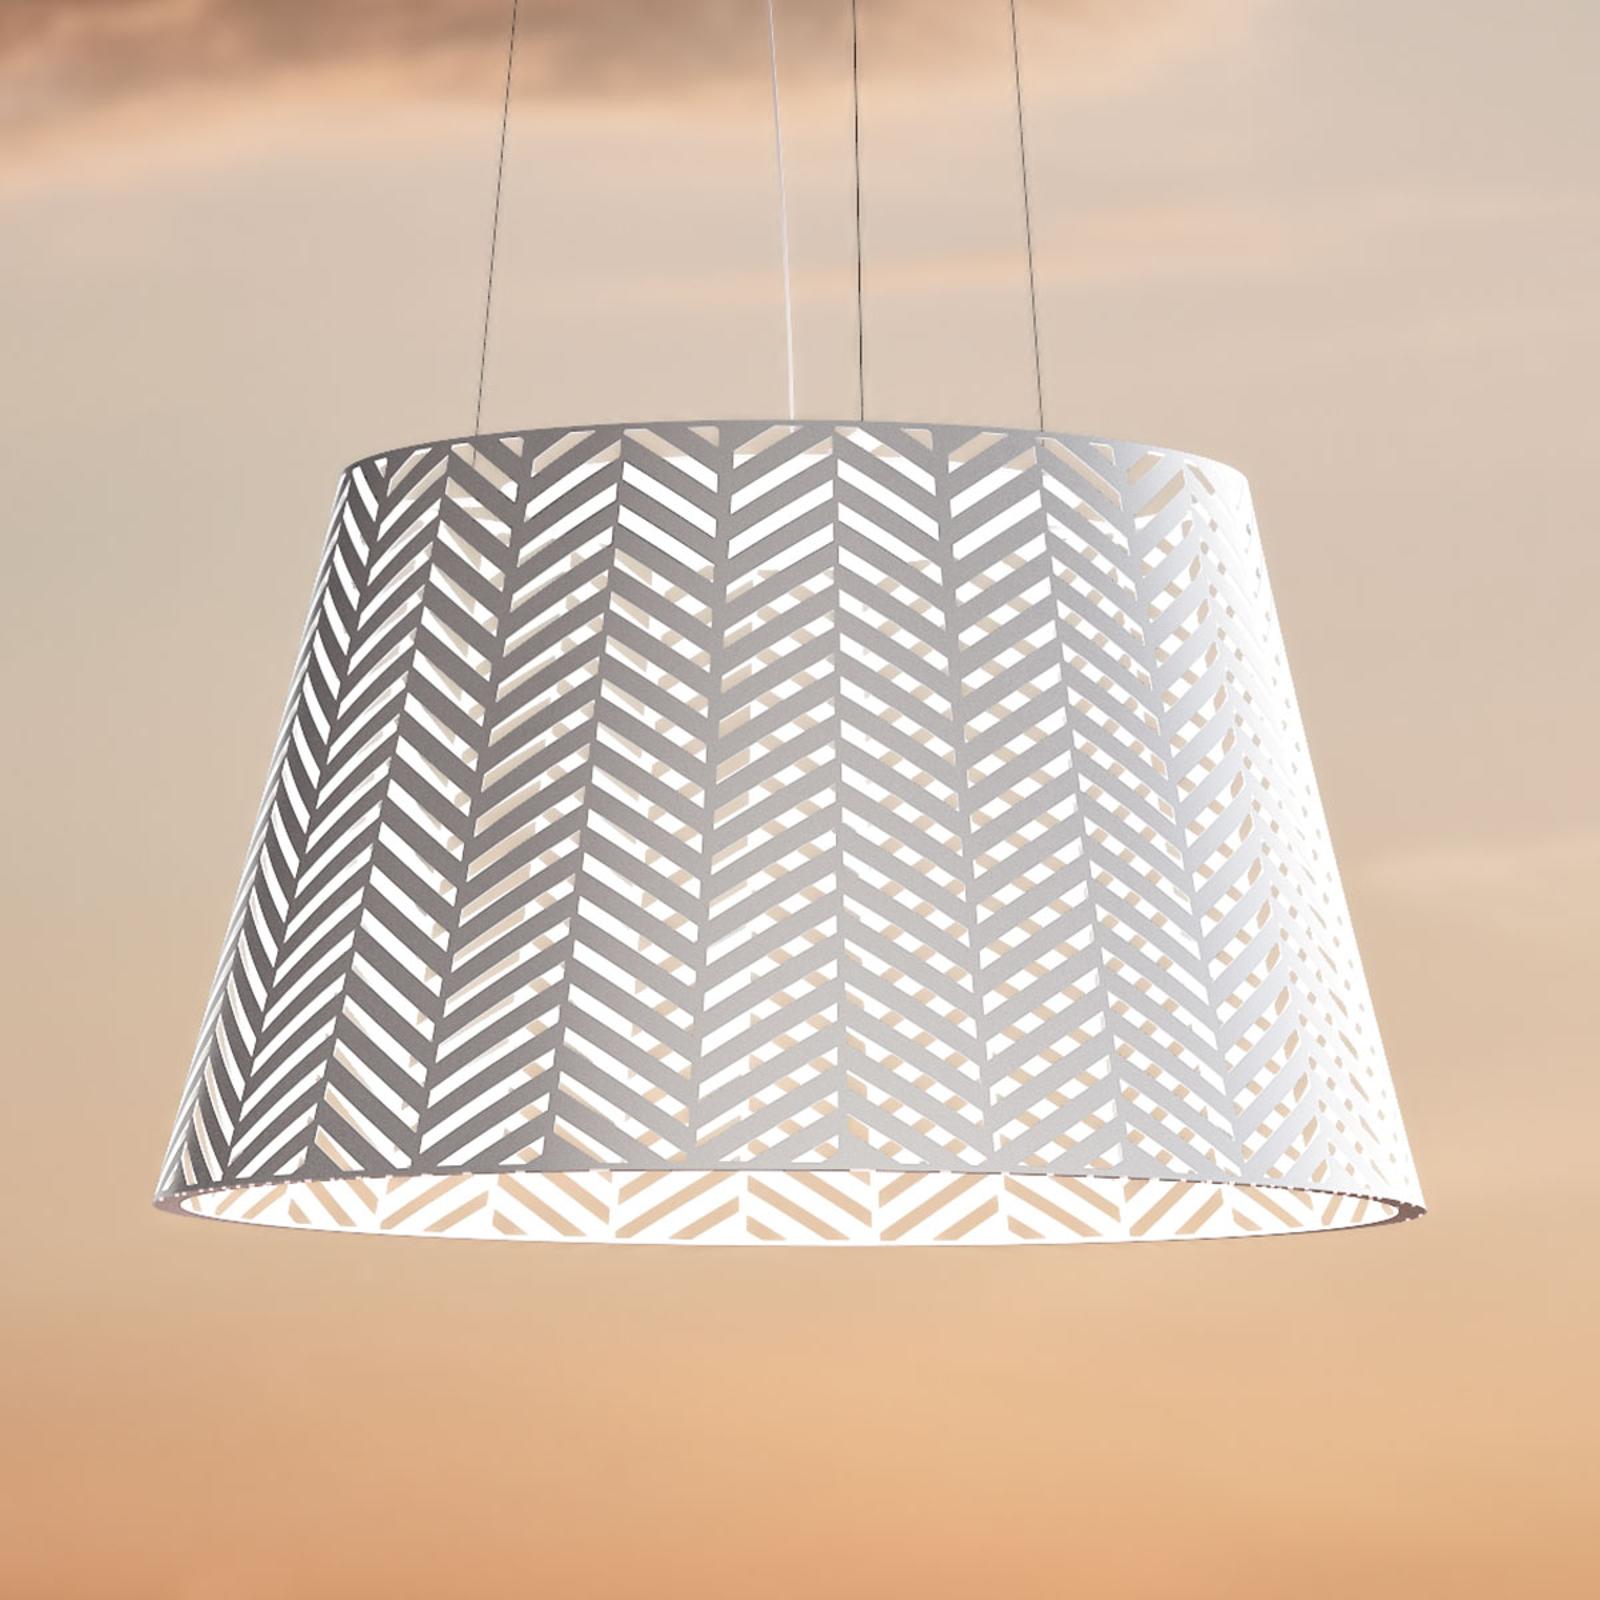 LED-pendellampa Spike inomhus-/utomhusbruk